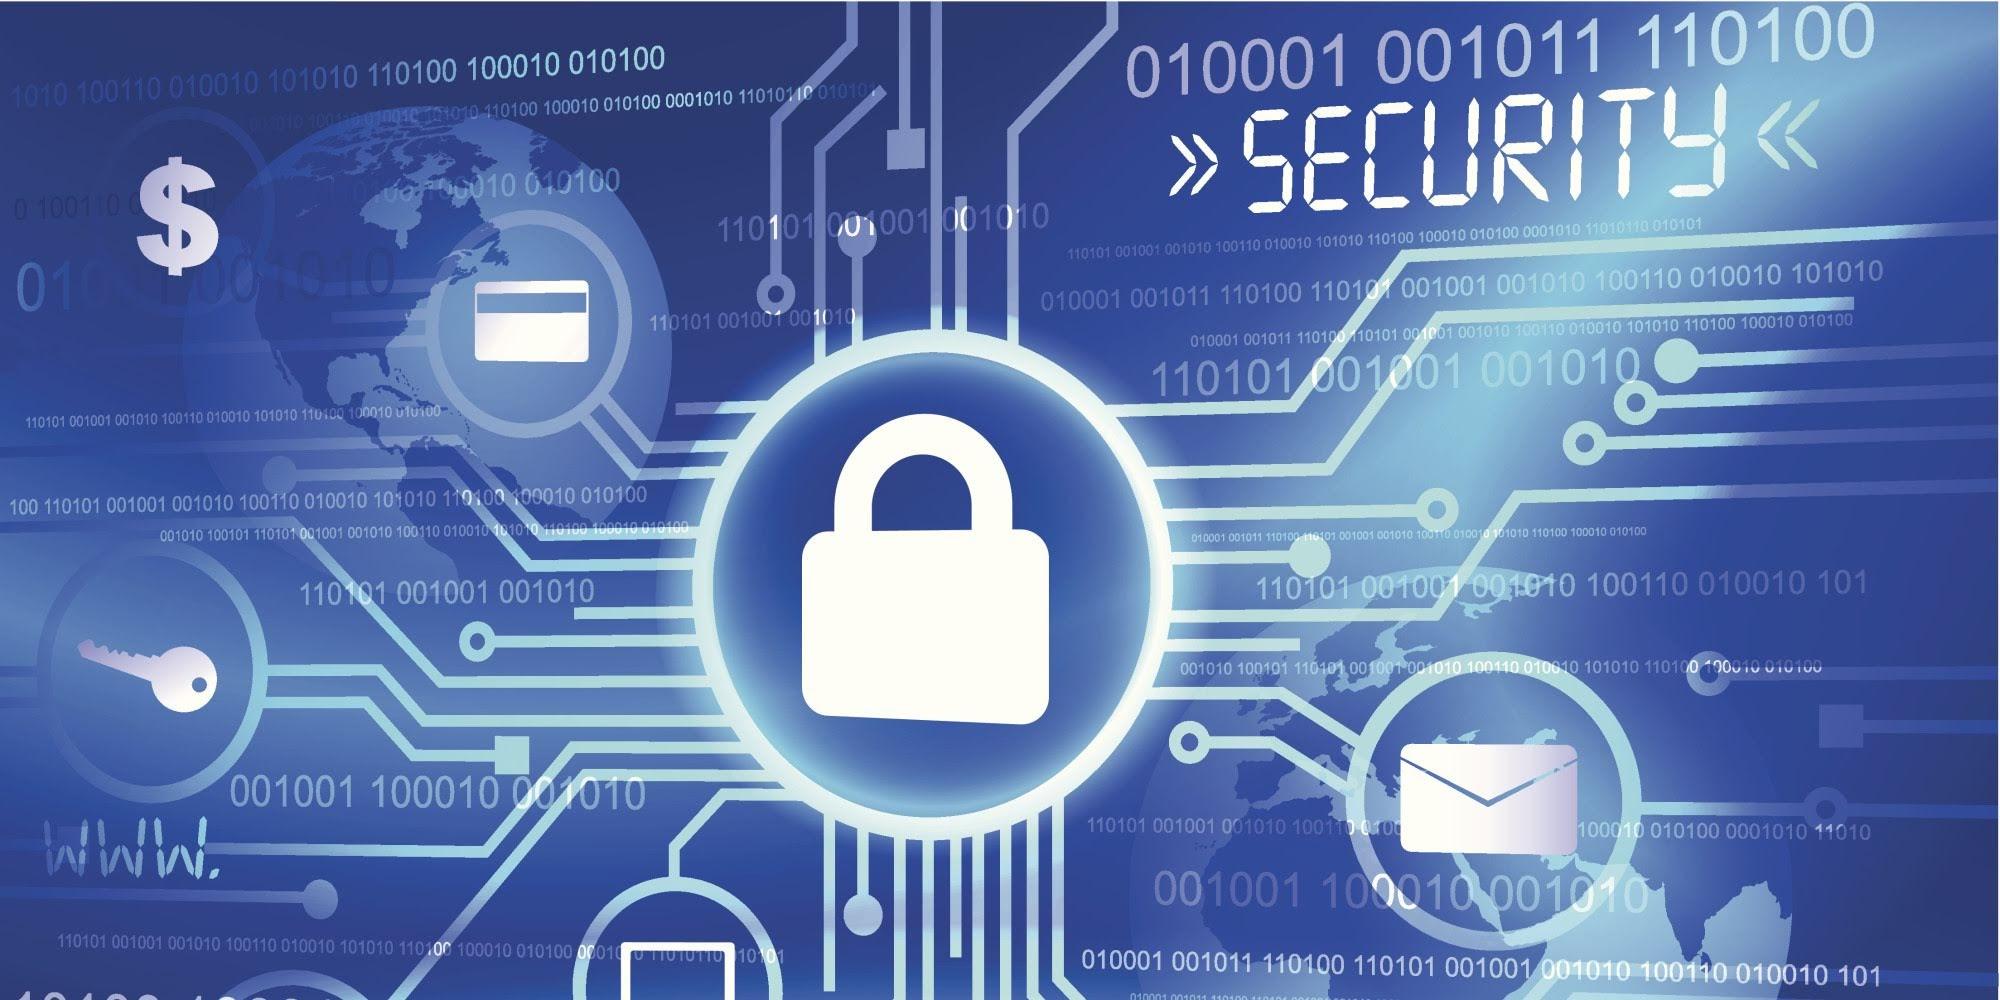 Norton Antivirus And Security